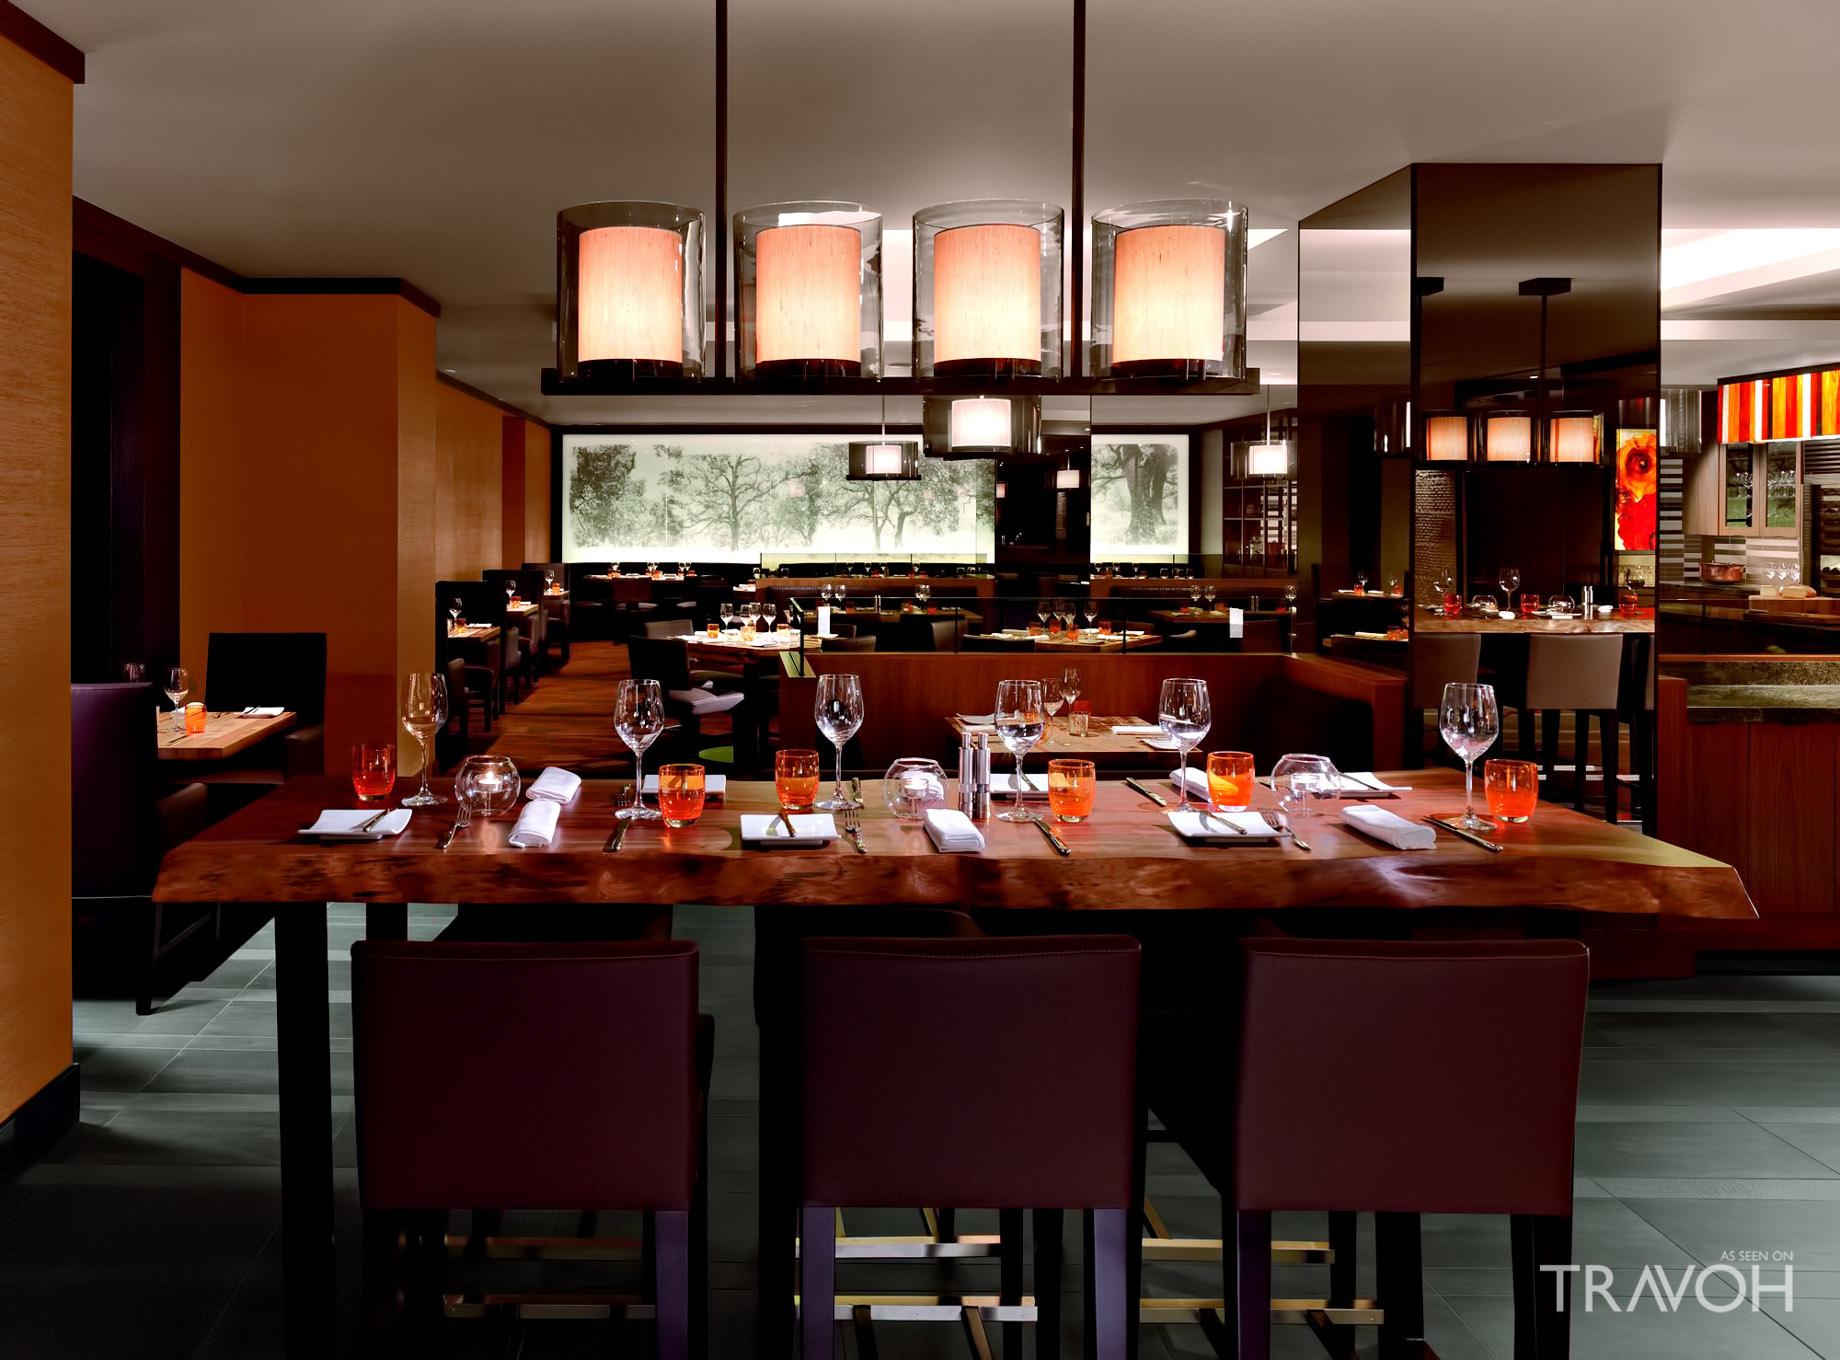 Parallel 37 Restaurant - Ritz Carlton Hotel 600 Stockton St, San Francisco, CA, USA